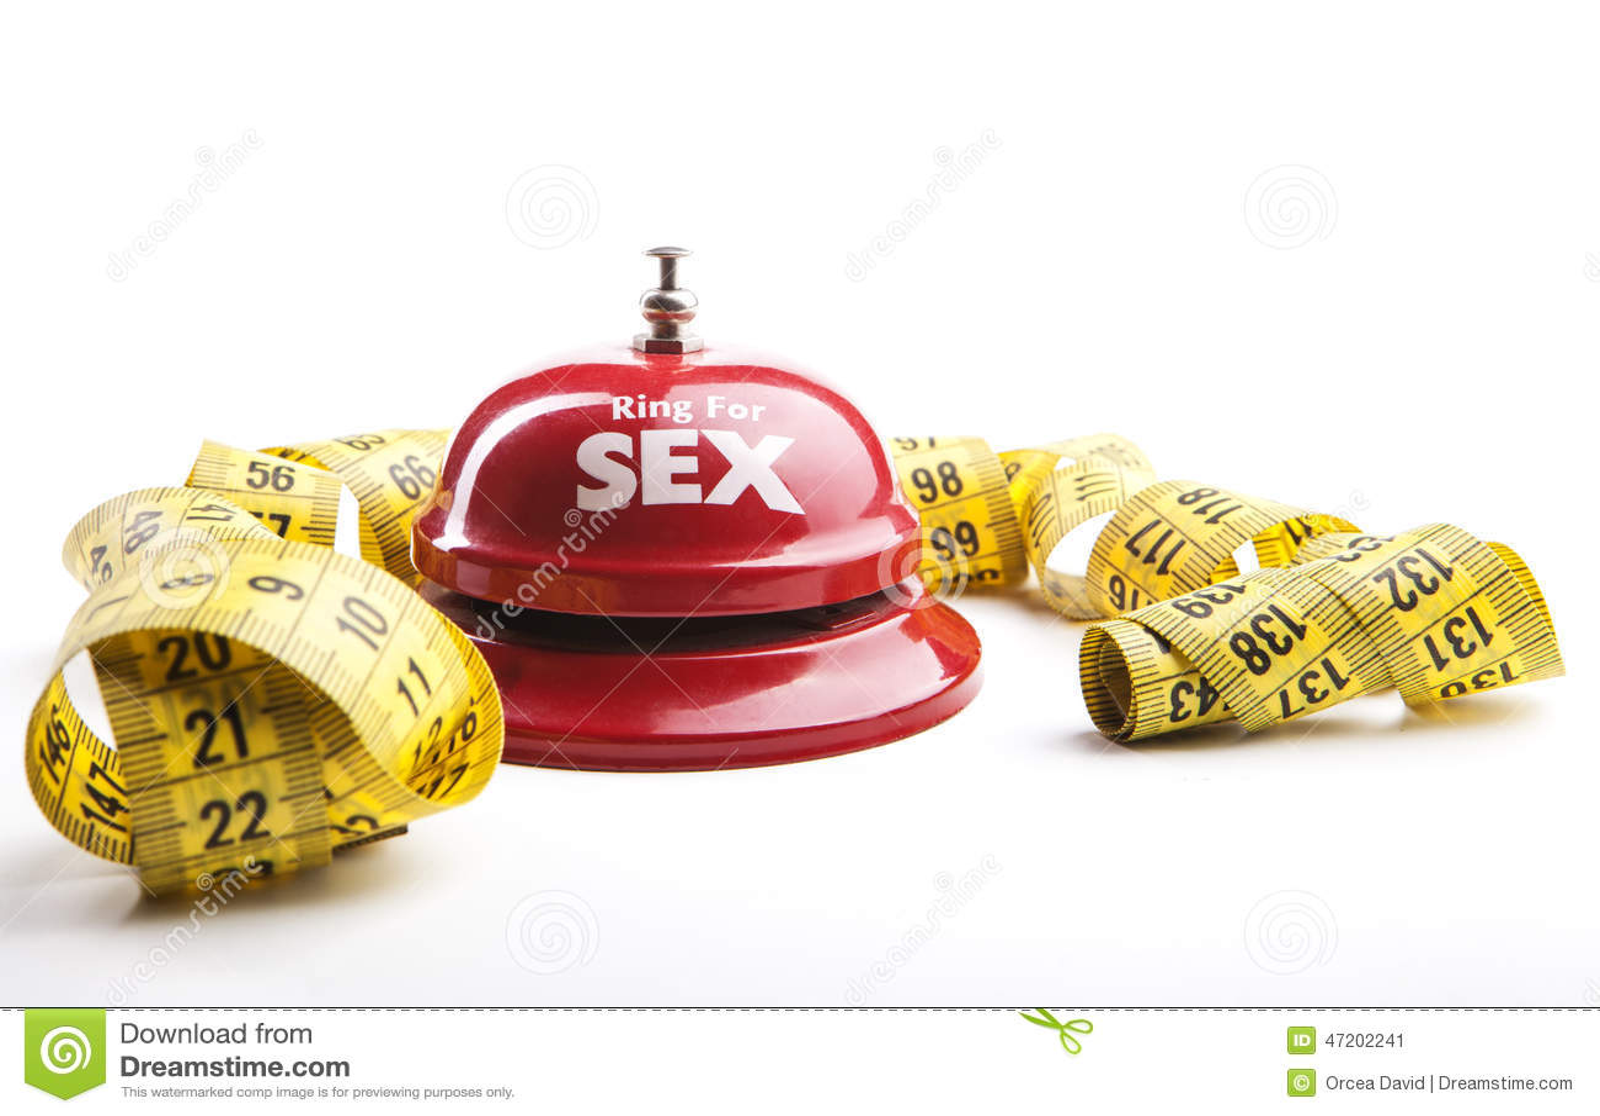 The Pre-Sex Diet